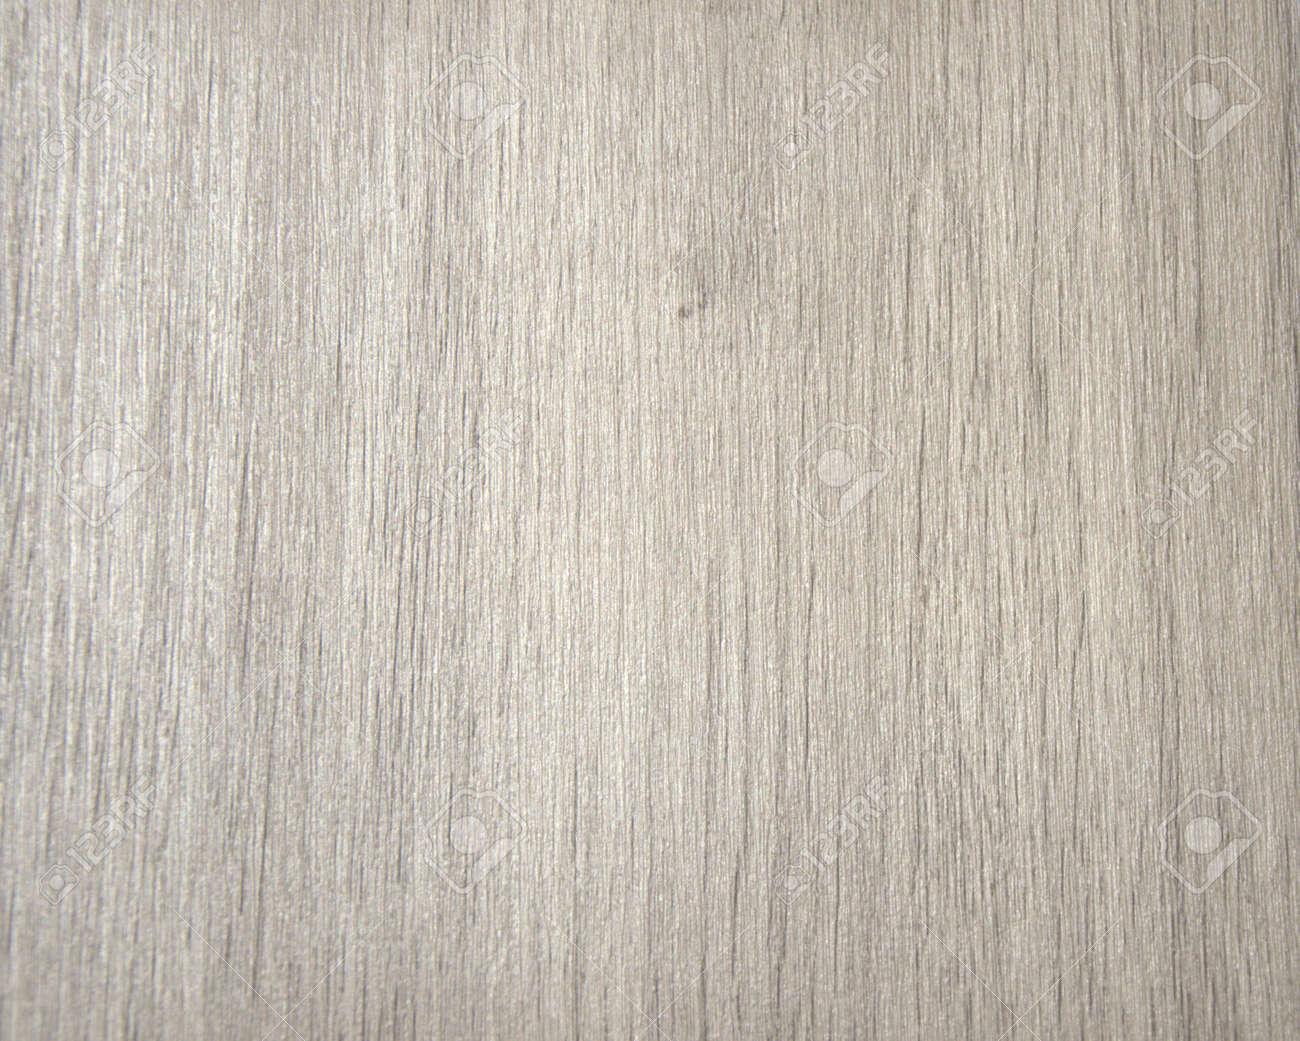 Bleached oak, natural pattern saw cut. Background, pattern, texture Close-up - 119002929